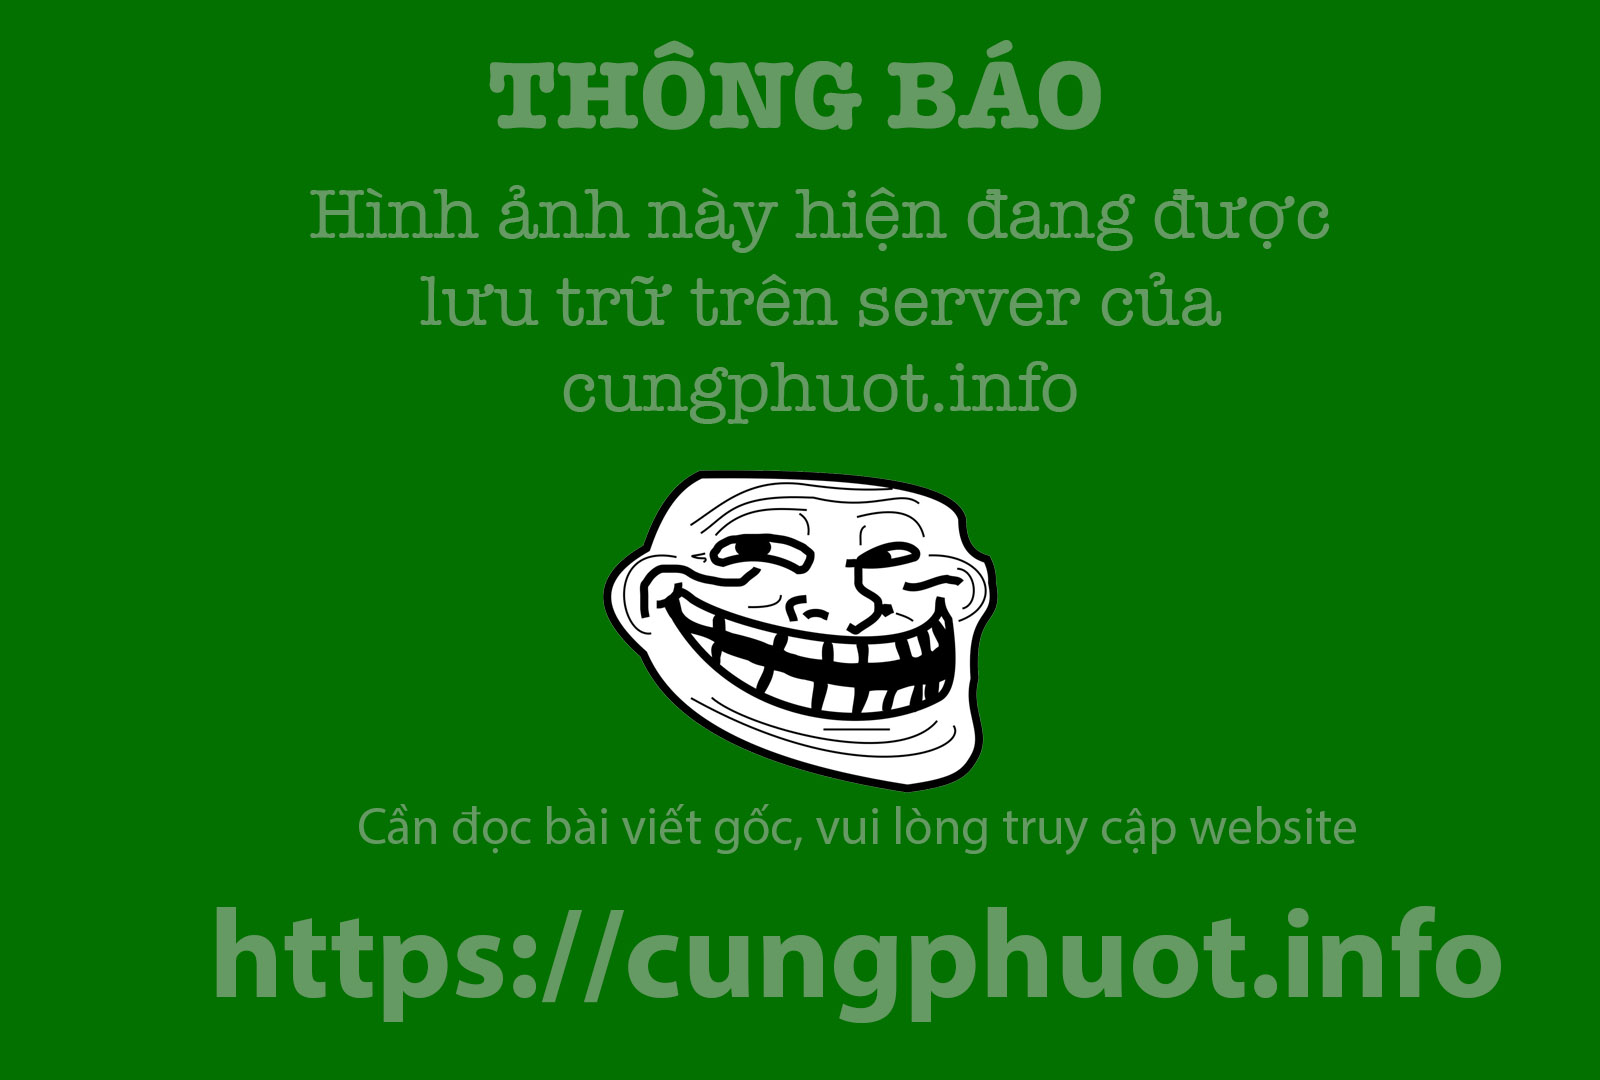 nhung-tiem-ca-phe-dep-phai-di-mot-lan-cho-biet-o-da-nang-ivivu-9